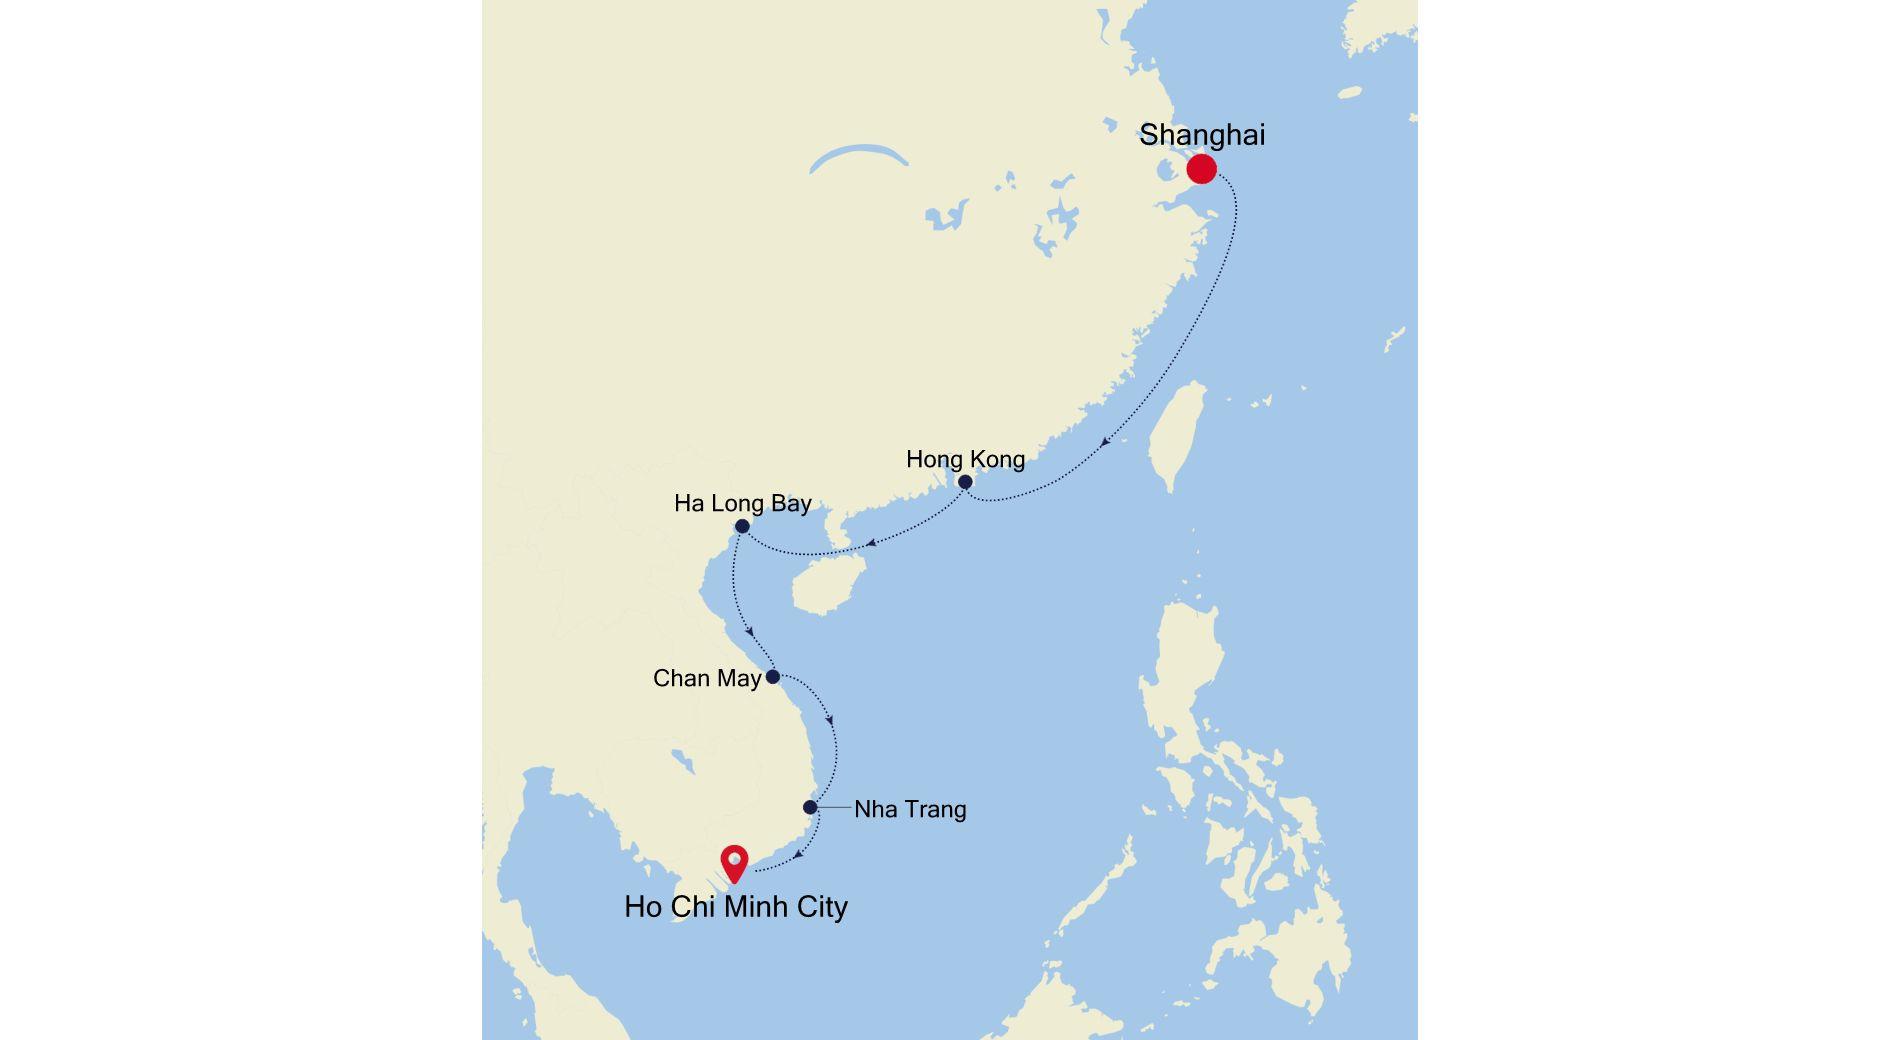 SL210223S13 - Shanghai nach Ho Chi Minh City